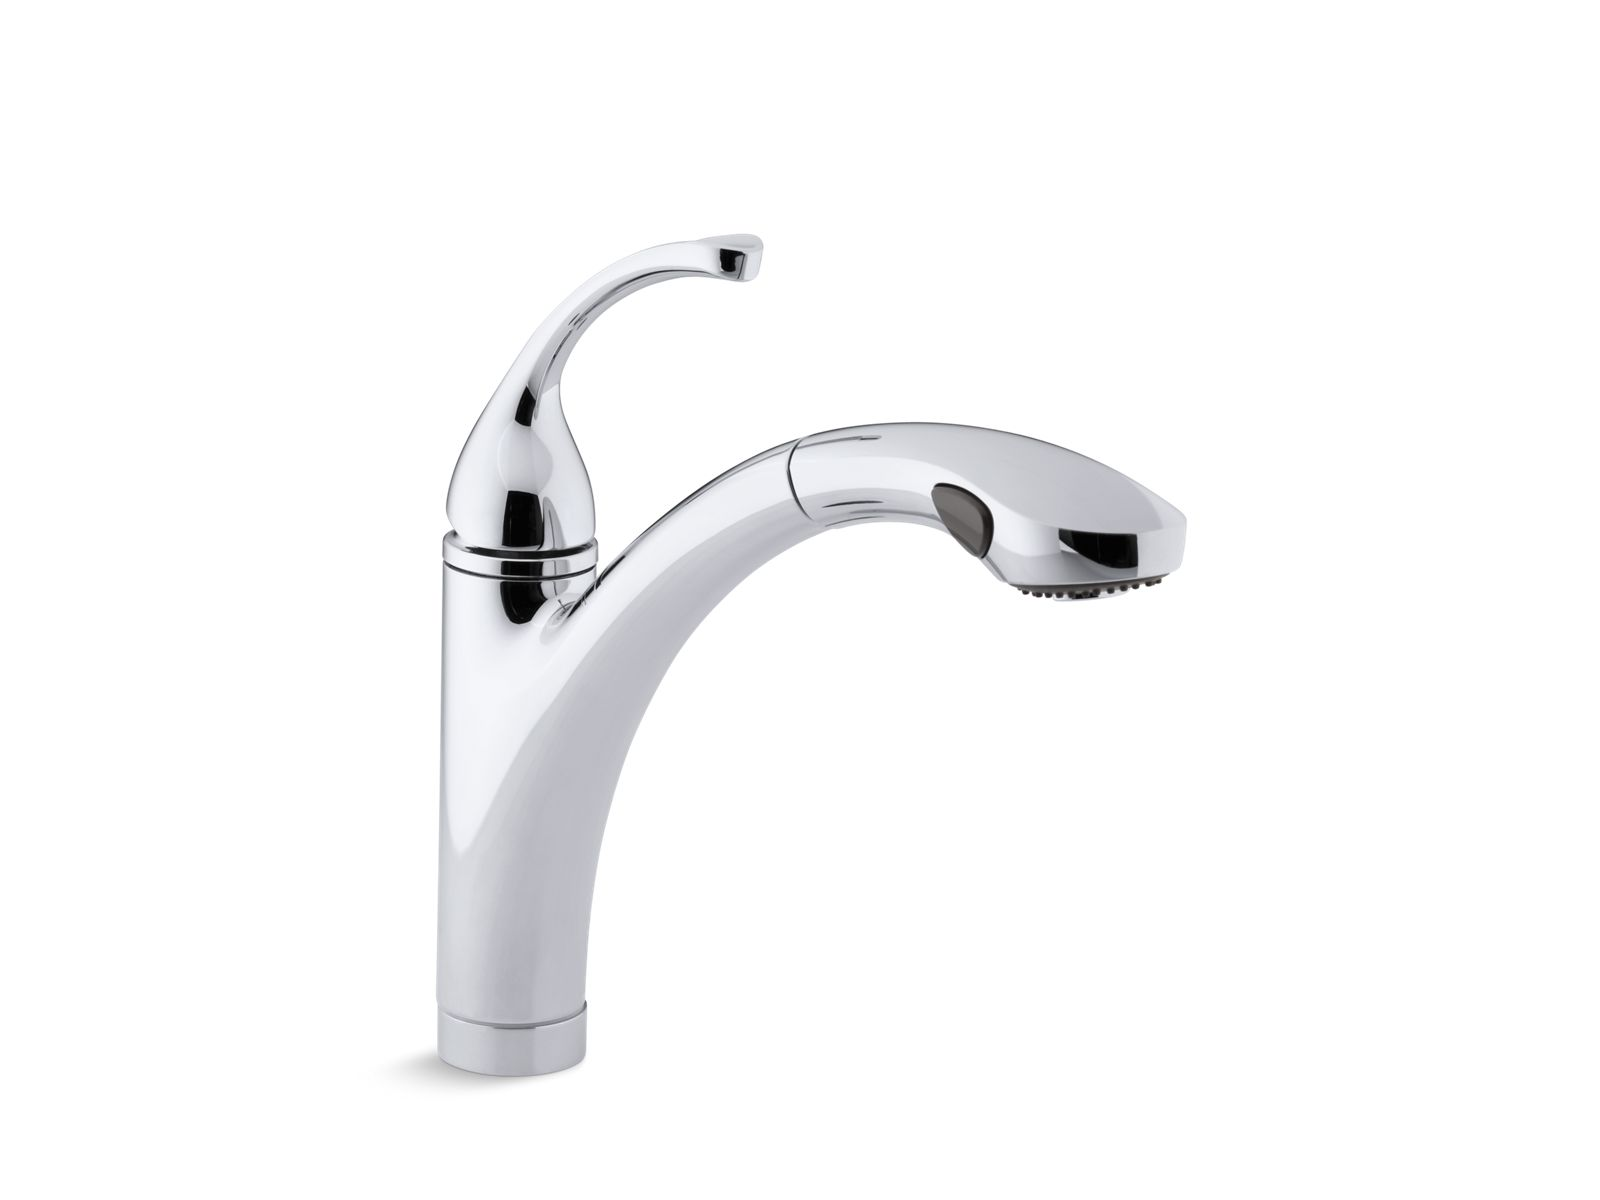 K 10433 | Forté Single Handle Pull Out Spray Kitchen Sink Faucet | KOHLER